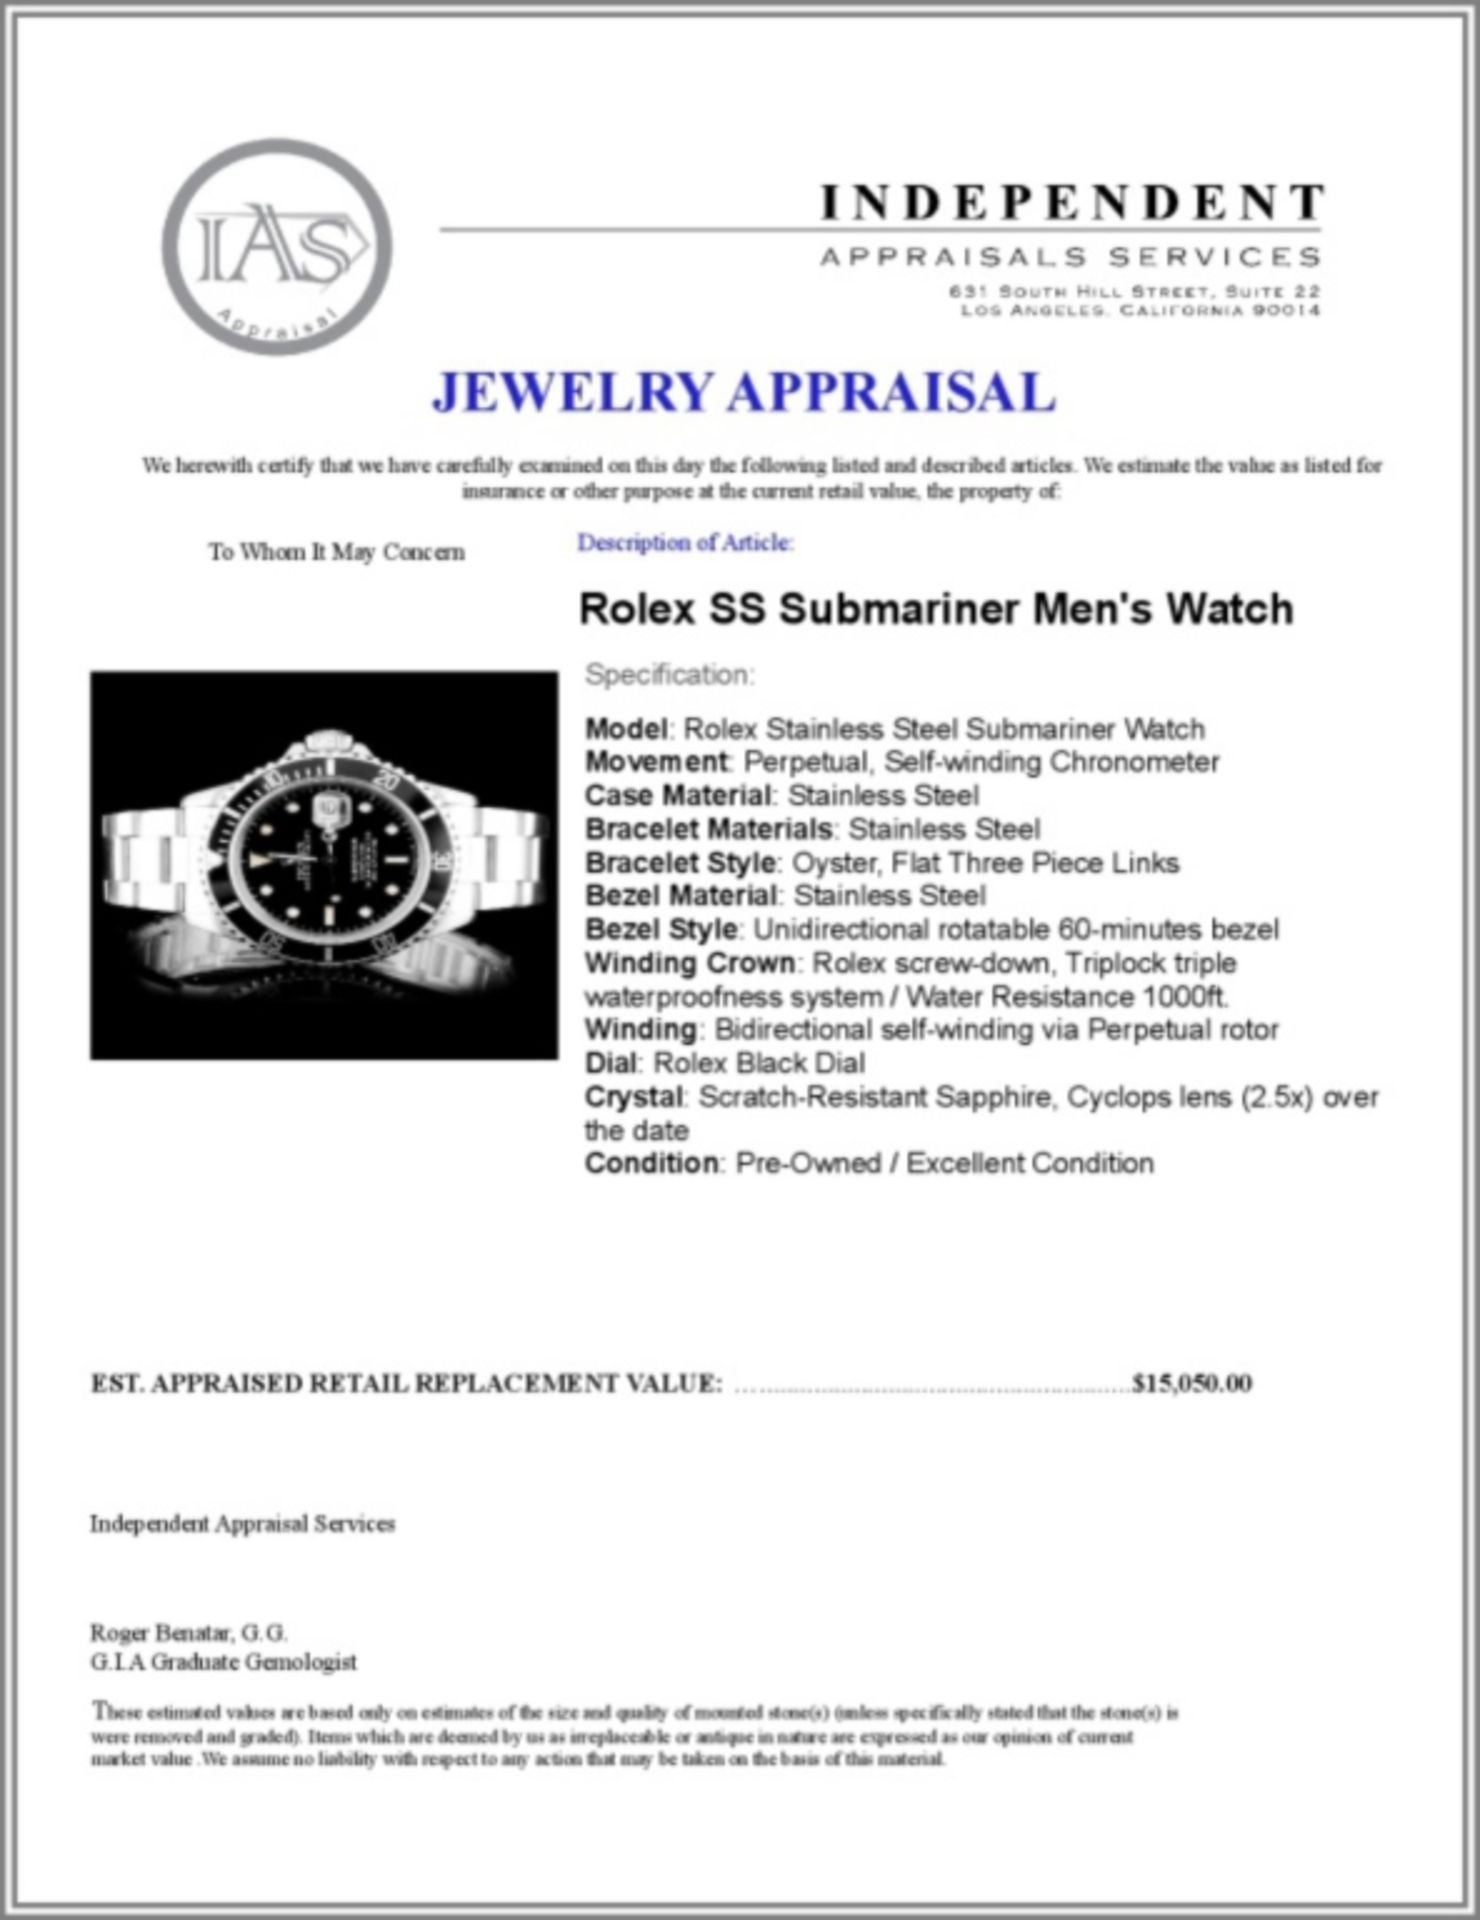 Rolex SS Submariner 40MM Wristwatch - Image 5 of 5